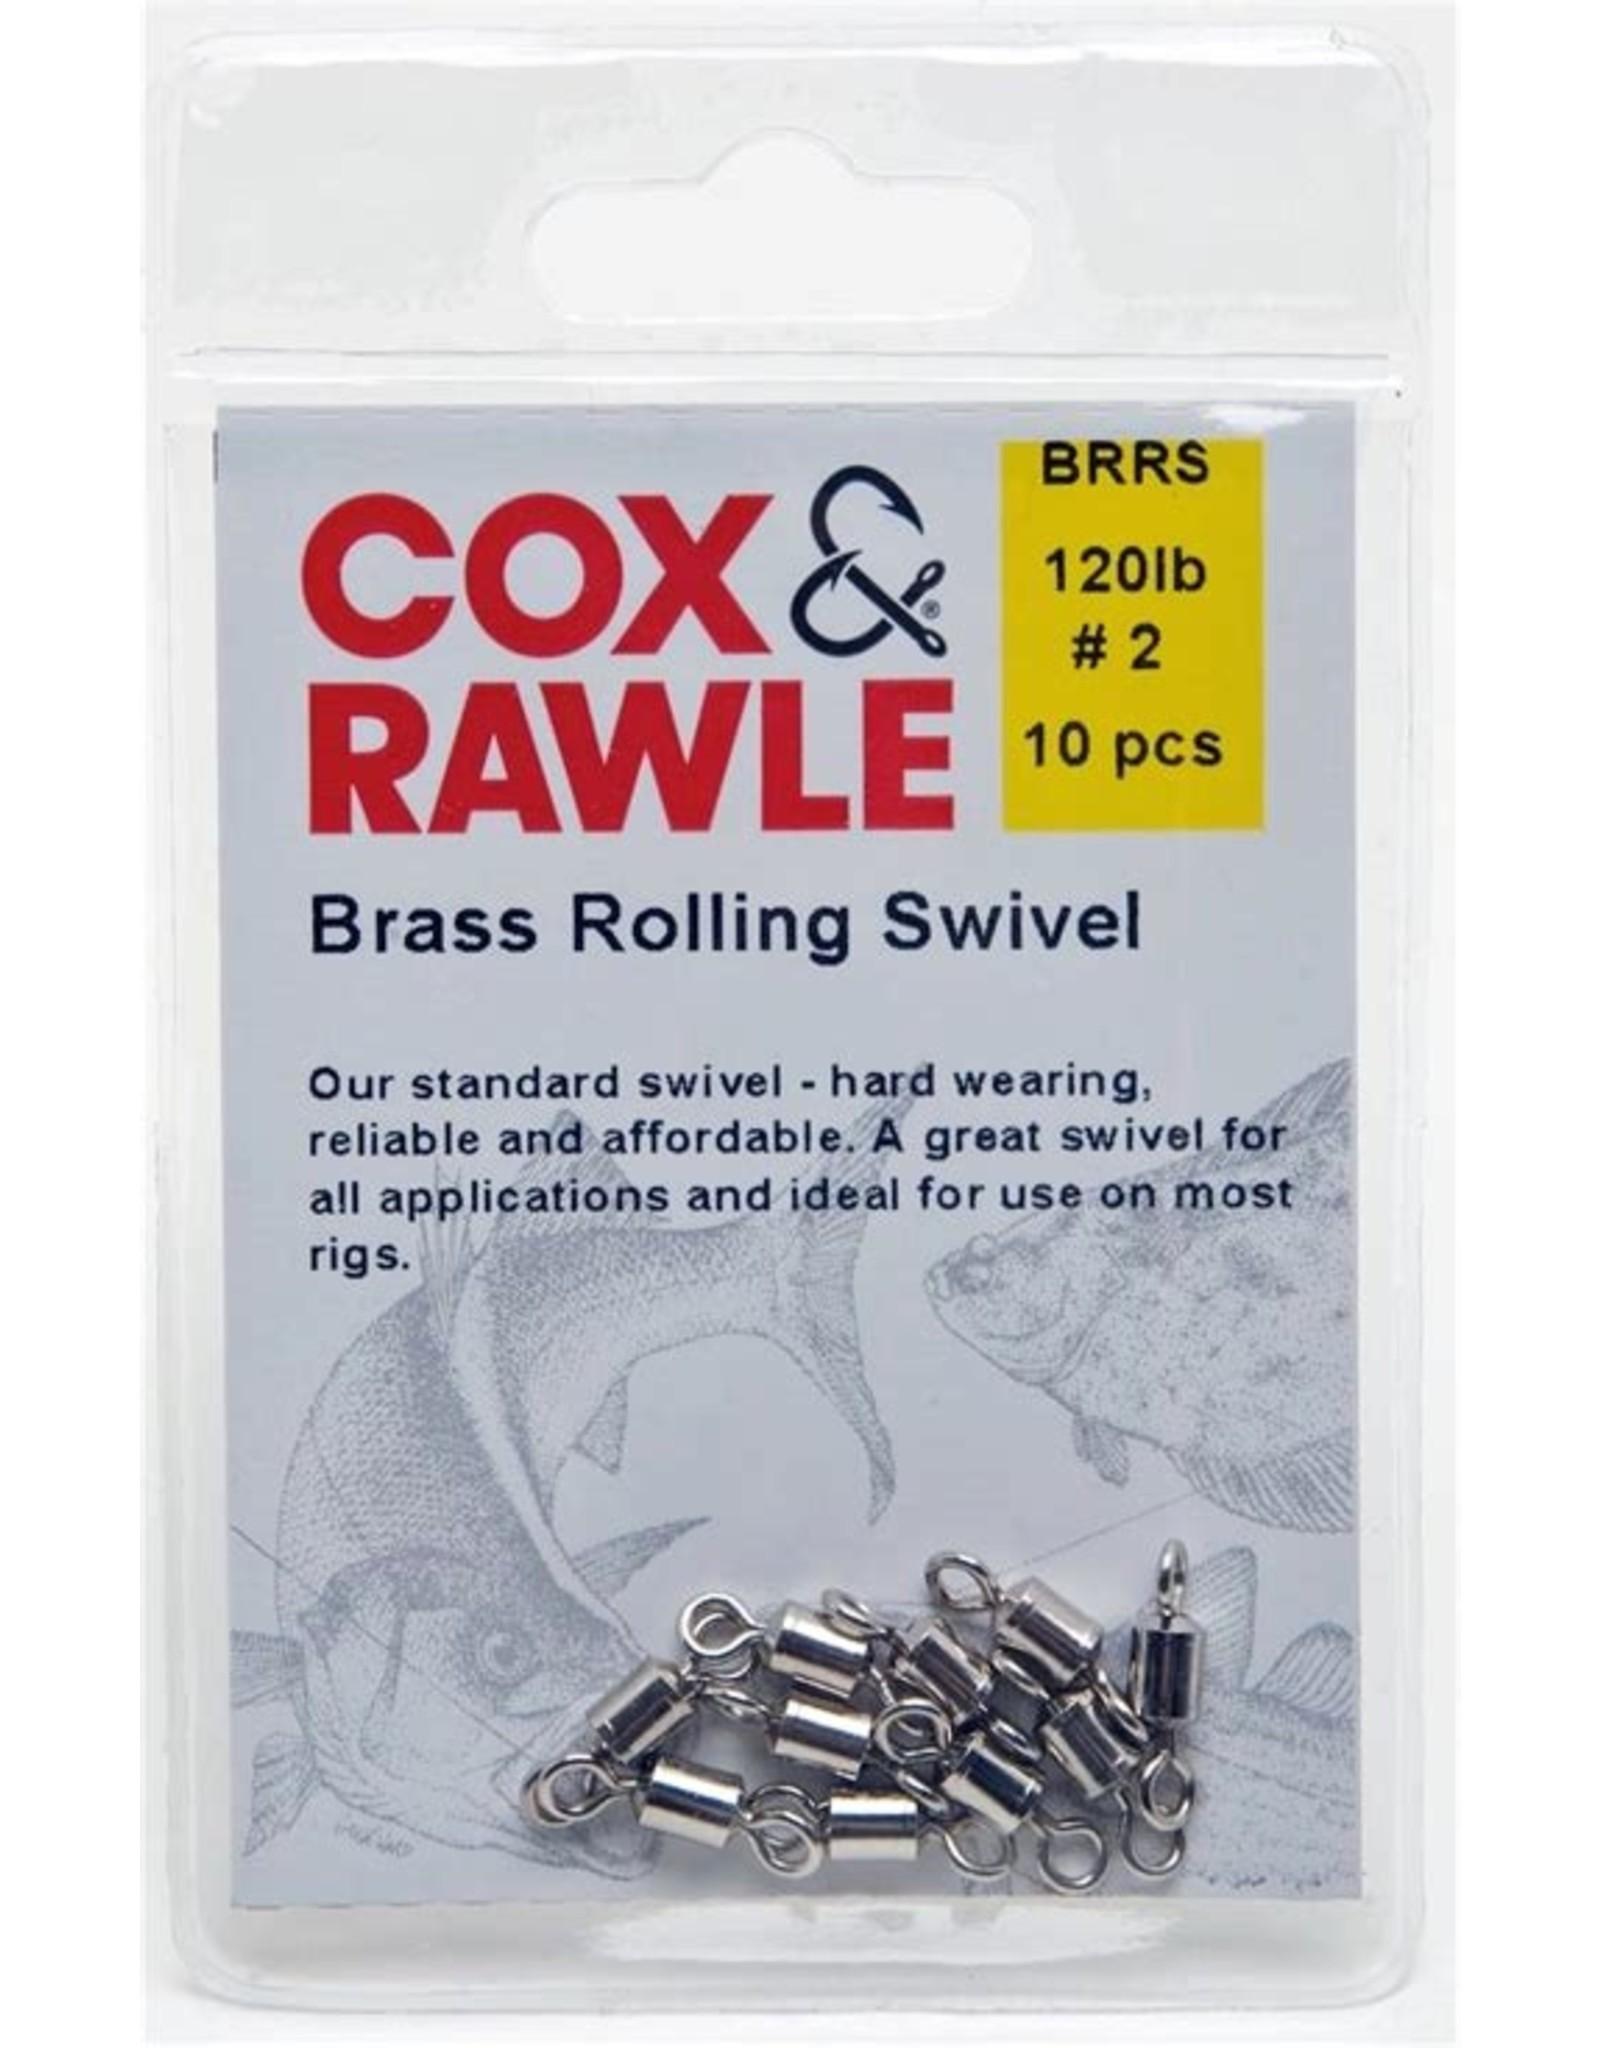 Cox & Rawle Cox & Rawle Rolling Swivel